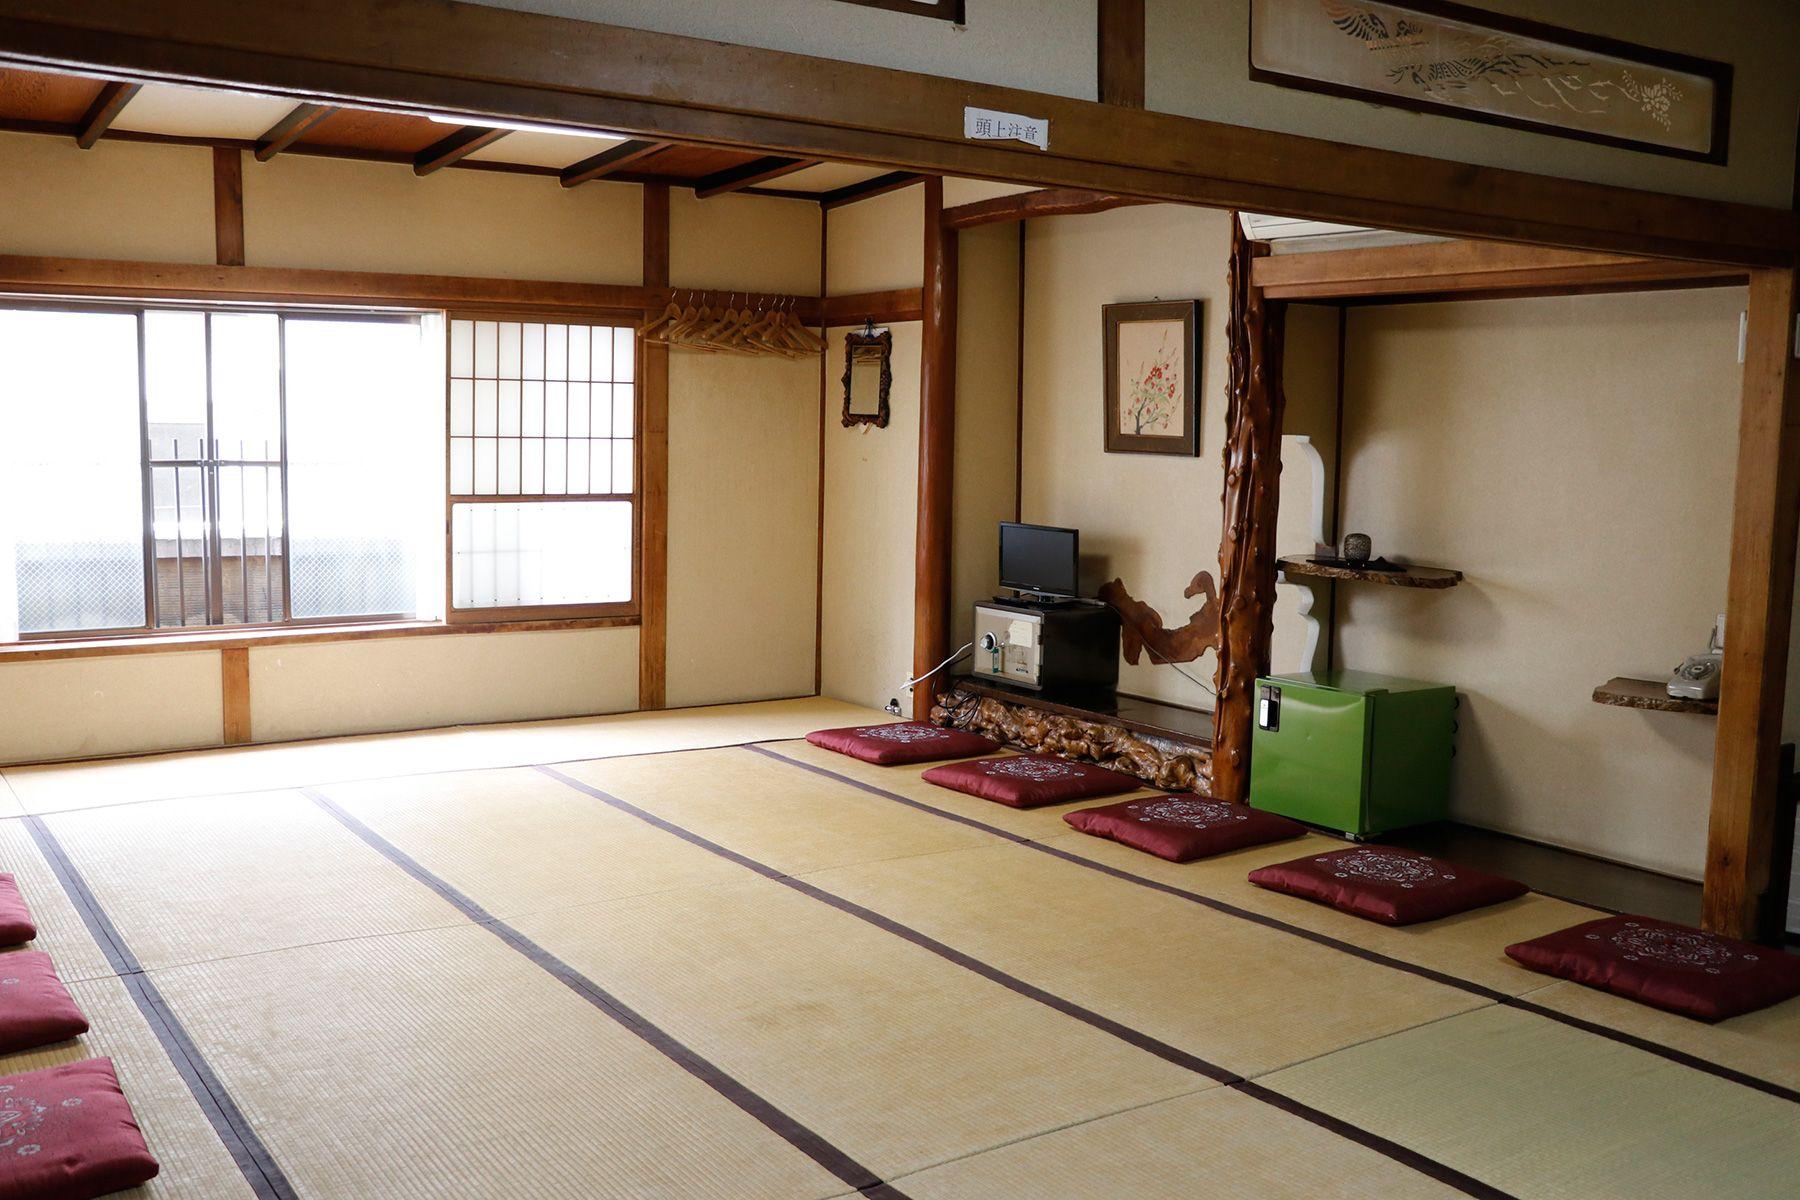 HOMEIKAN 森川別館/旅館 (ホウメイカン)春日+呉竹(22.5畳)窓は西向き